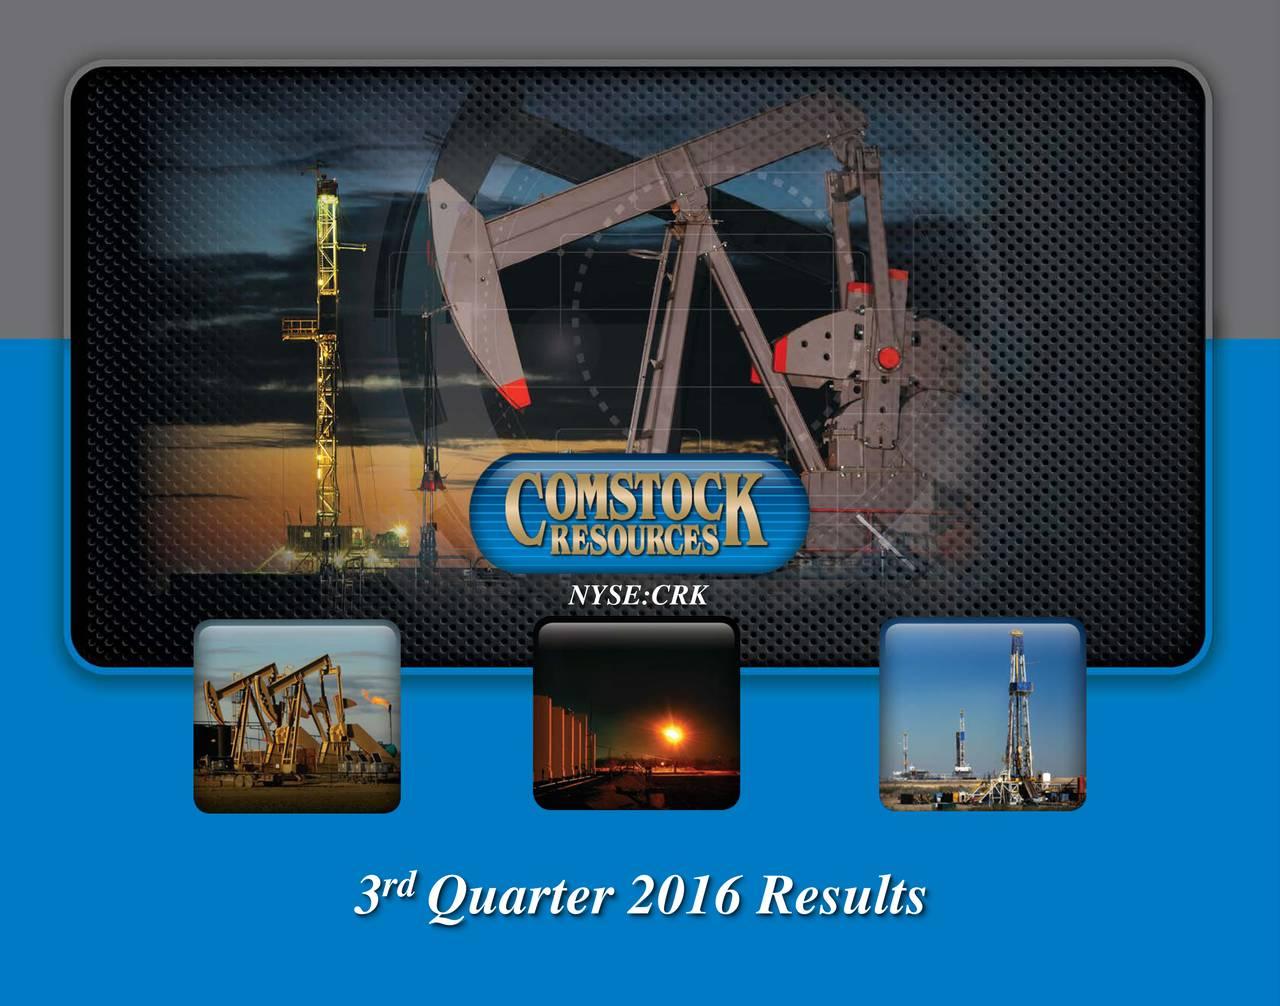 rd 3 Quarter 2016 Results